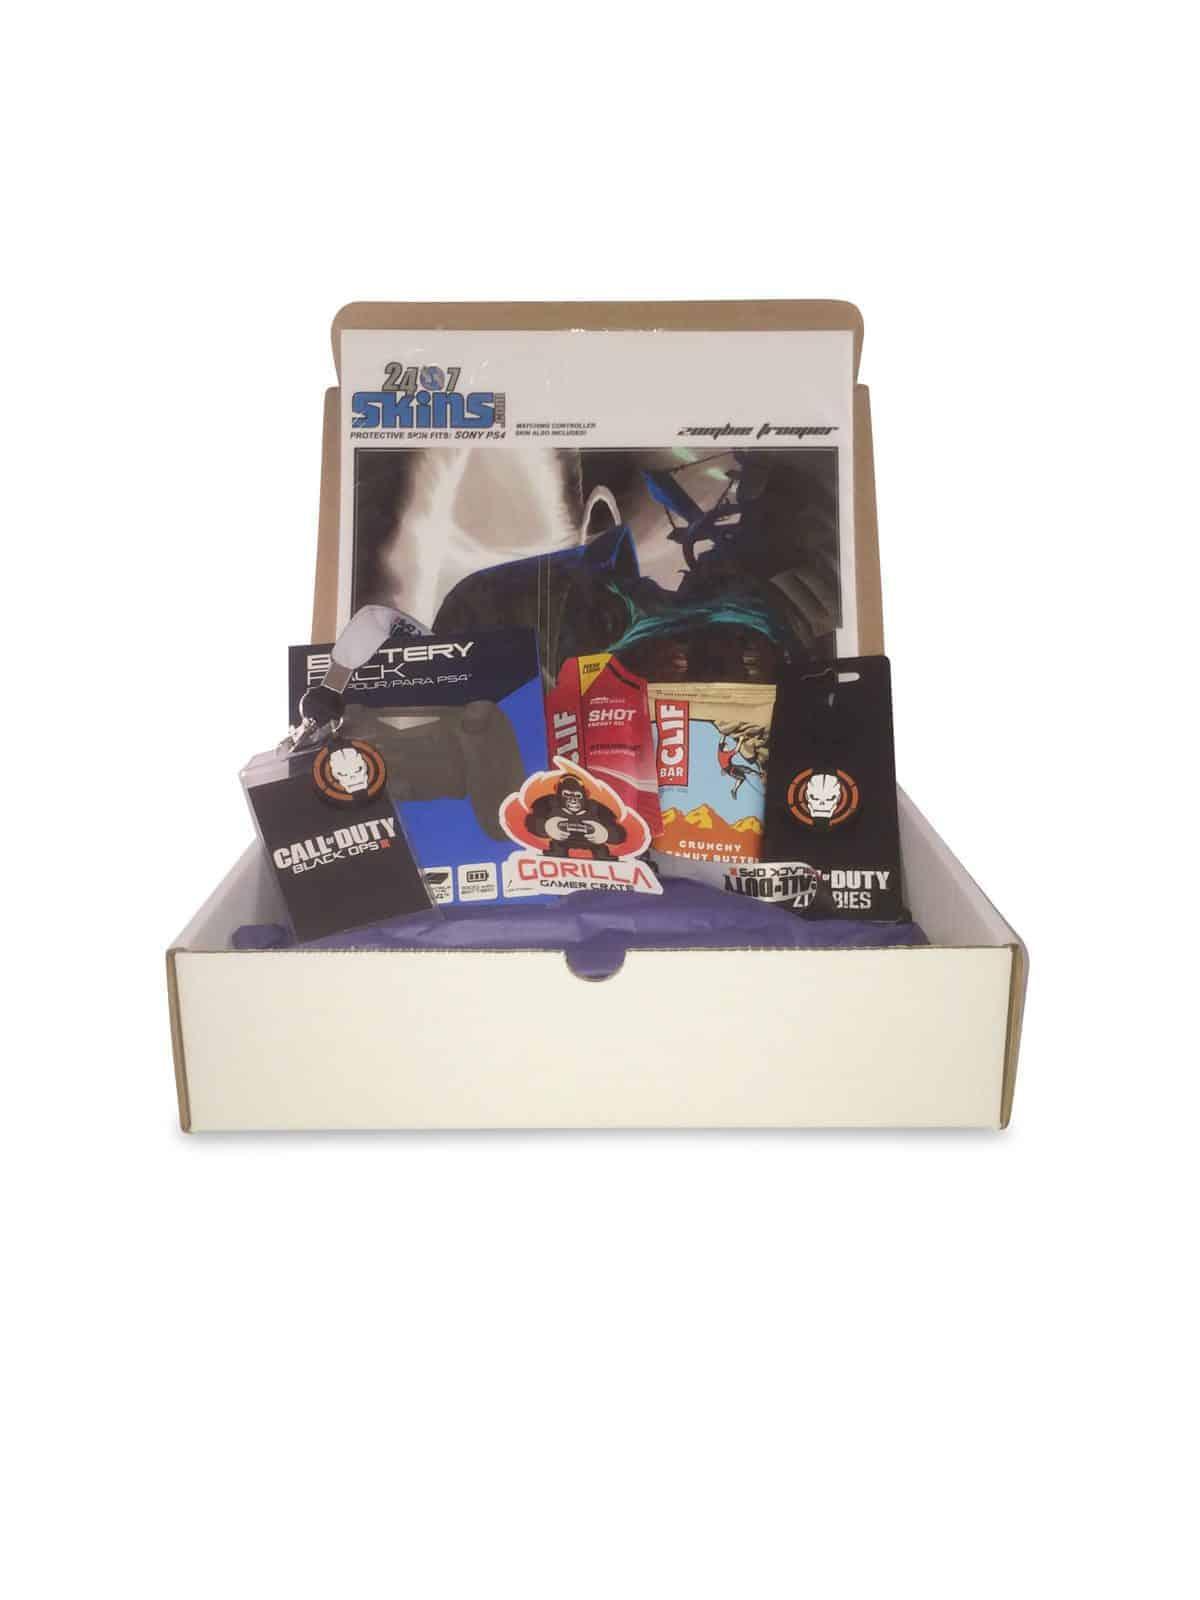 Gorilla Gamer Crate Subscription Box